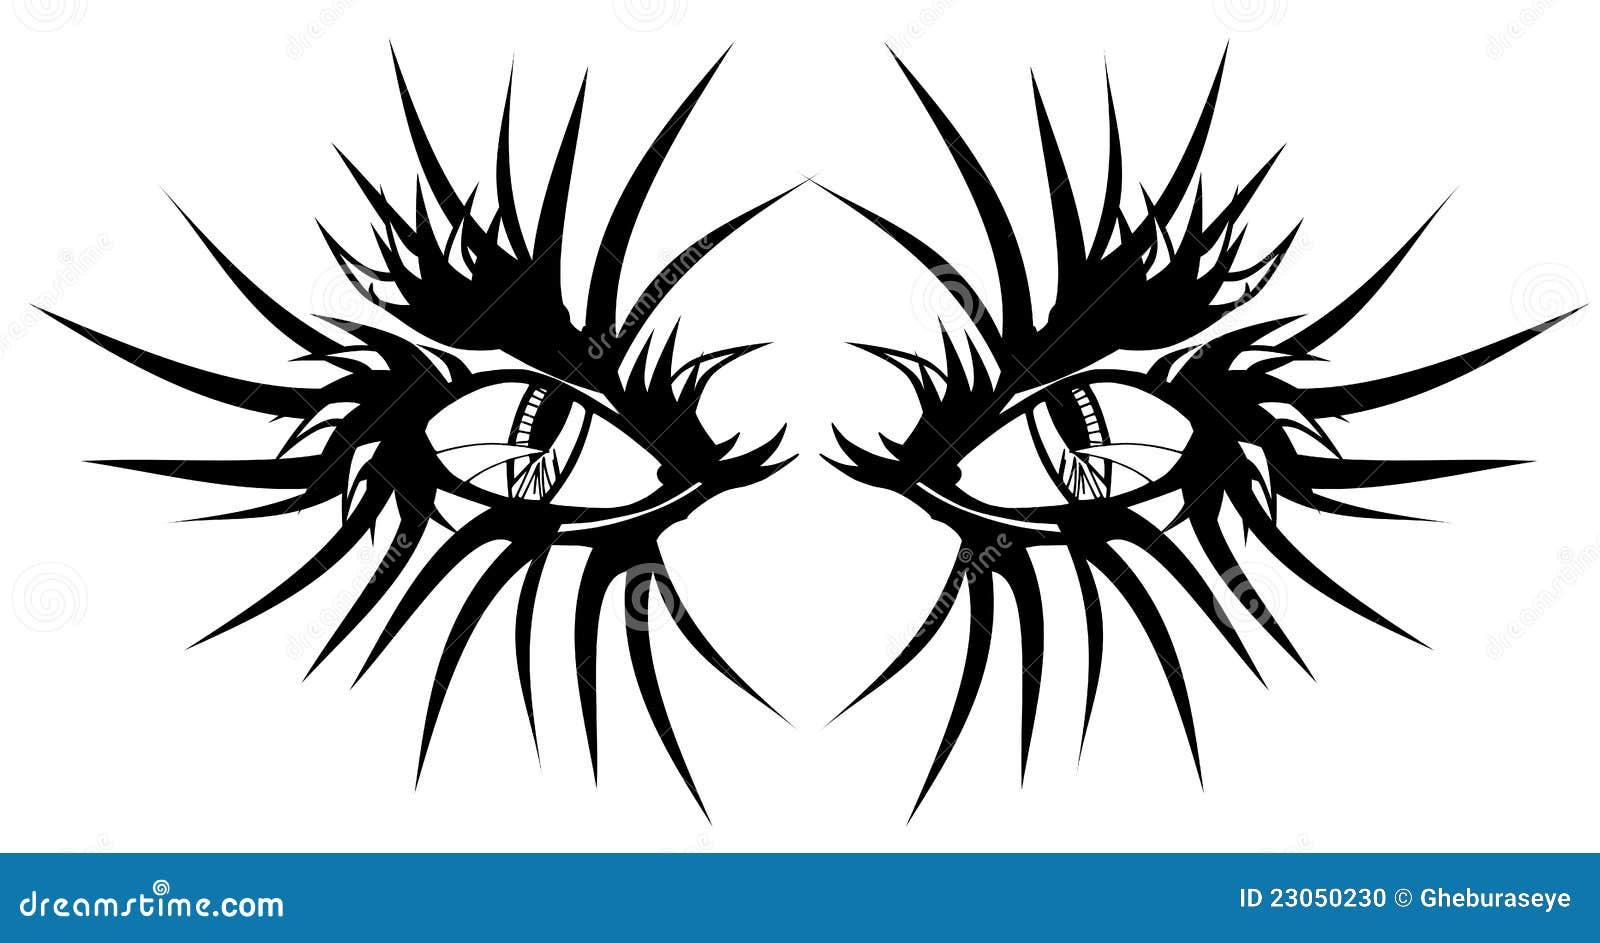 devil eyes tattoo stock photo image 23050230. Black Bedroom Furniture Sets. Home Design Ideas